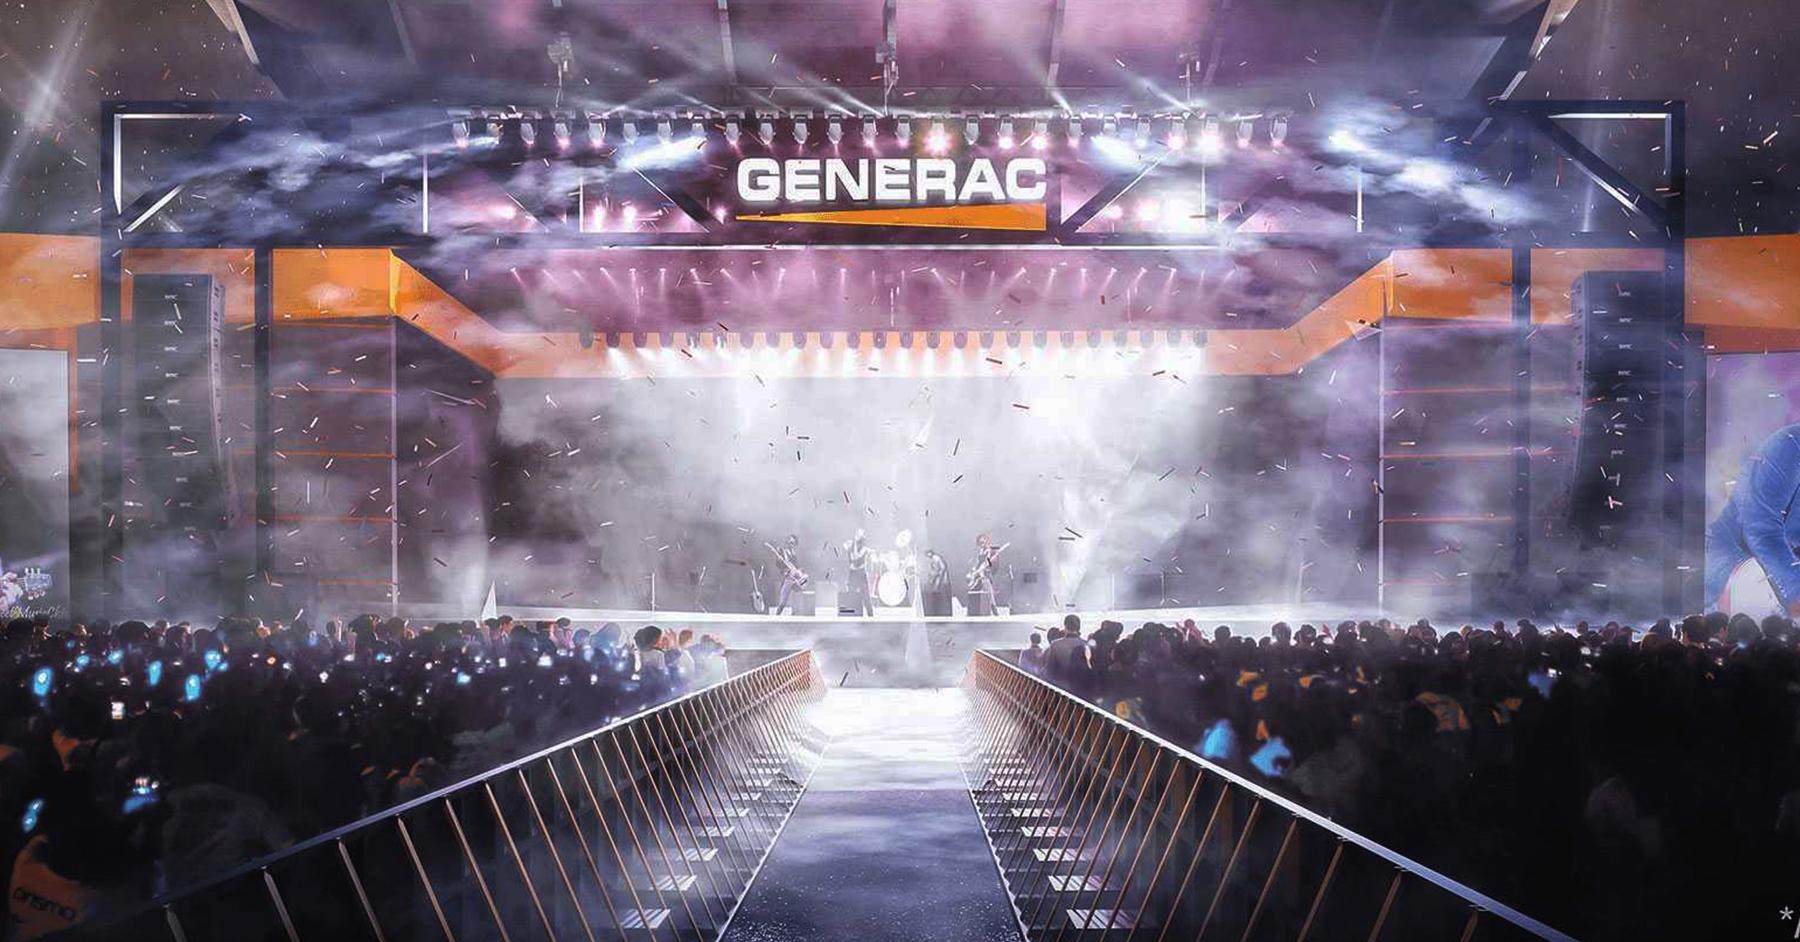 Generac, patrocinador oficial del Summerfest